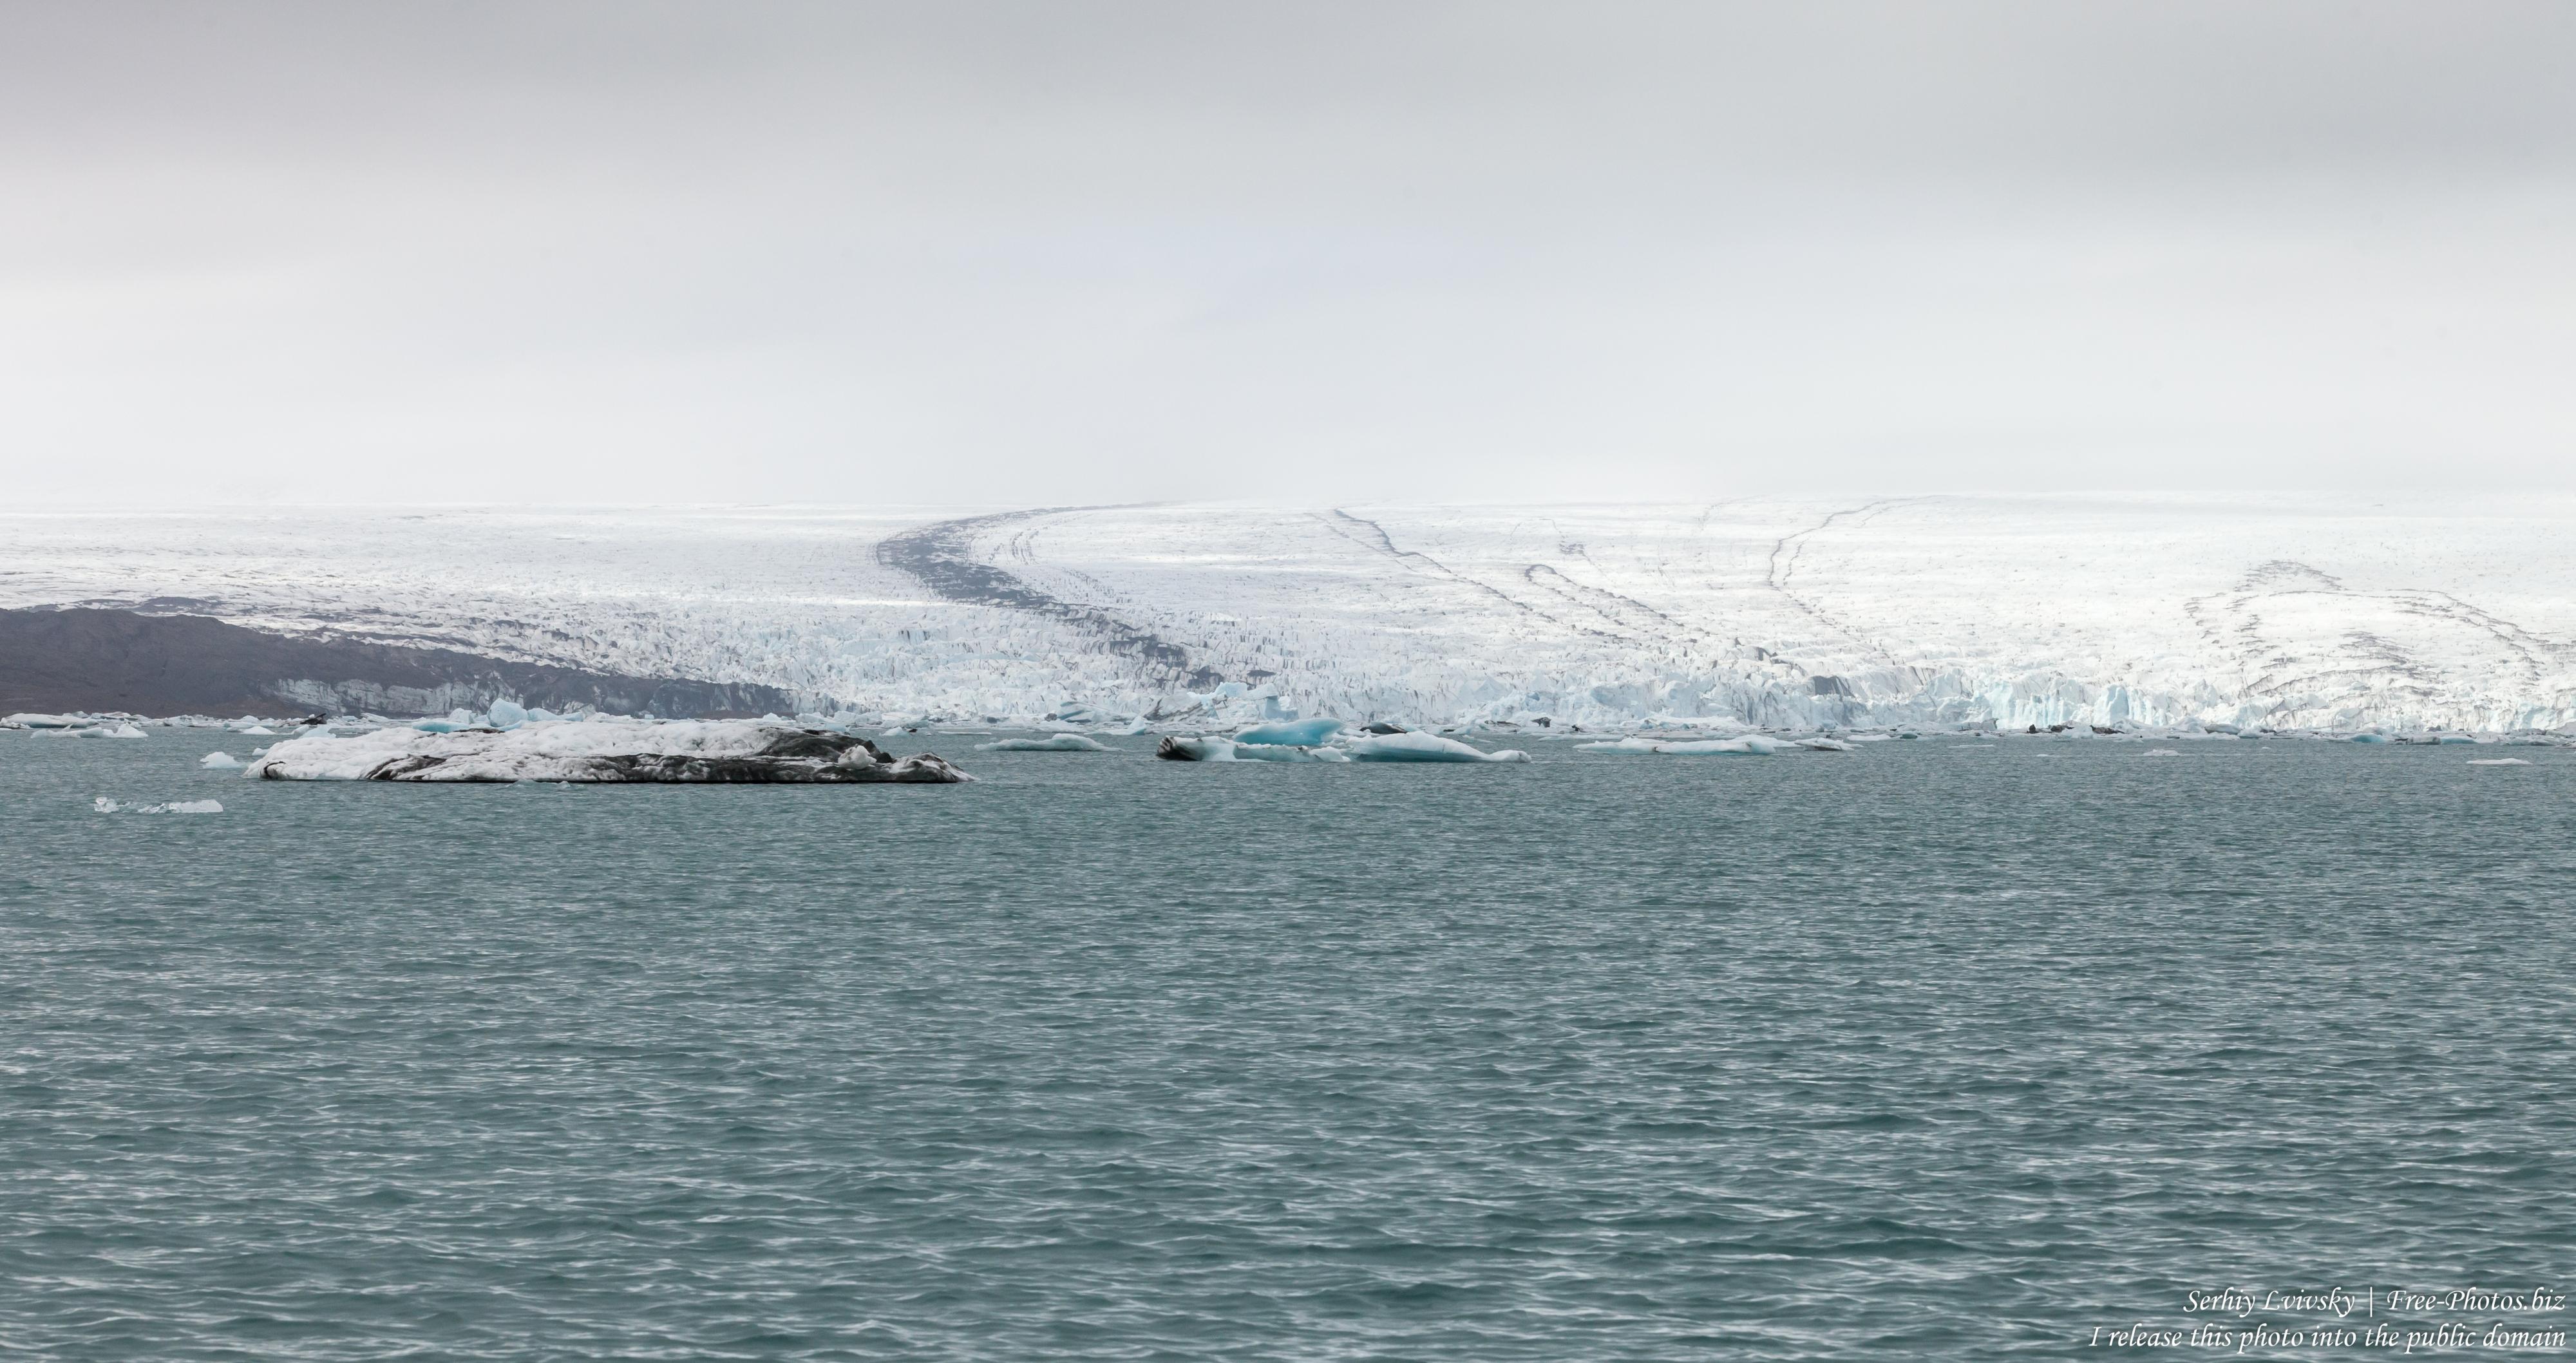 jokulsarlon_glacier_lagoon_iceland_in_may_2019_photographed_by_serhiy_lvivsky_38